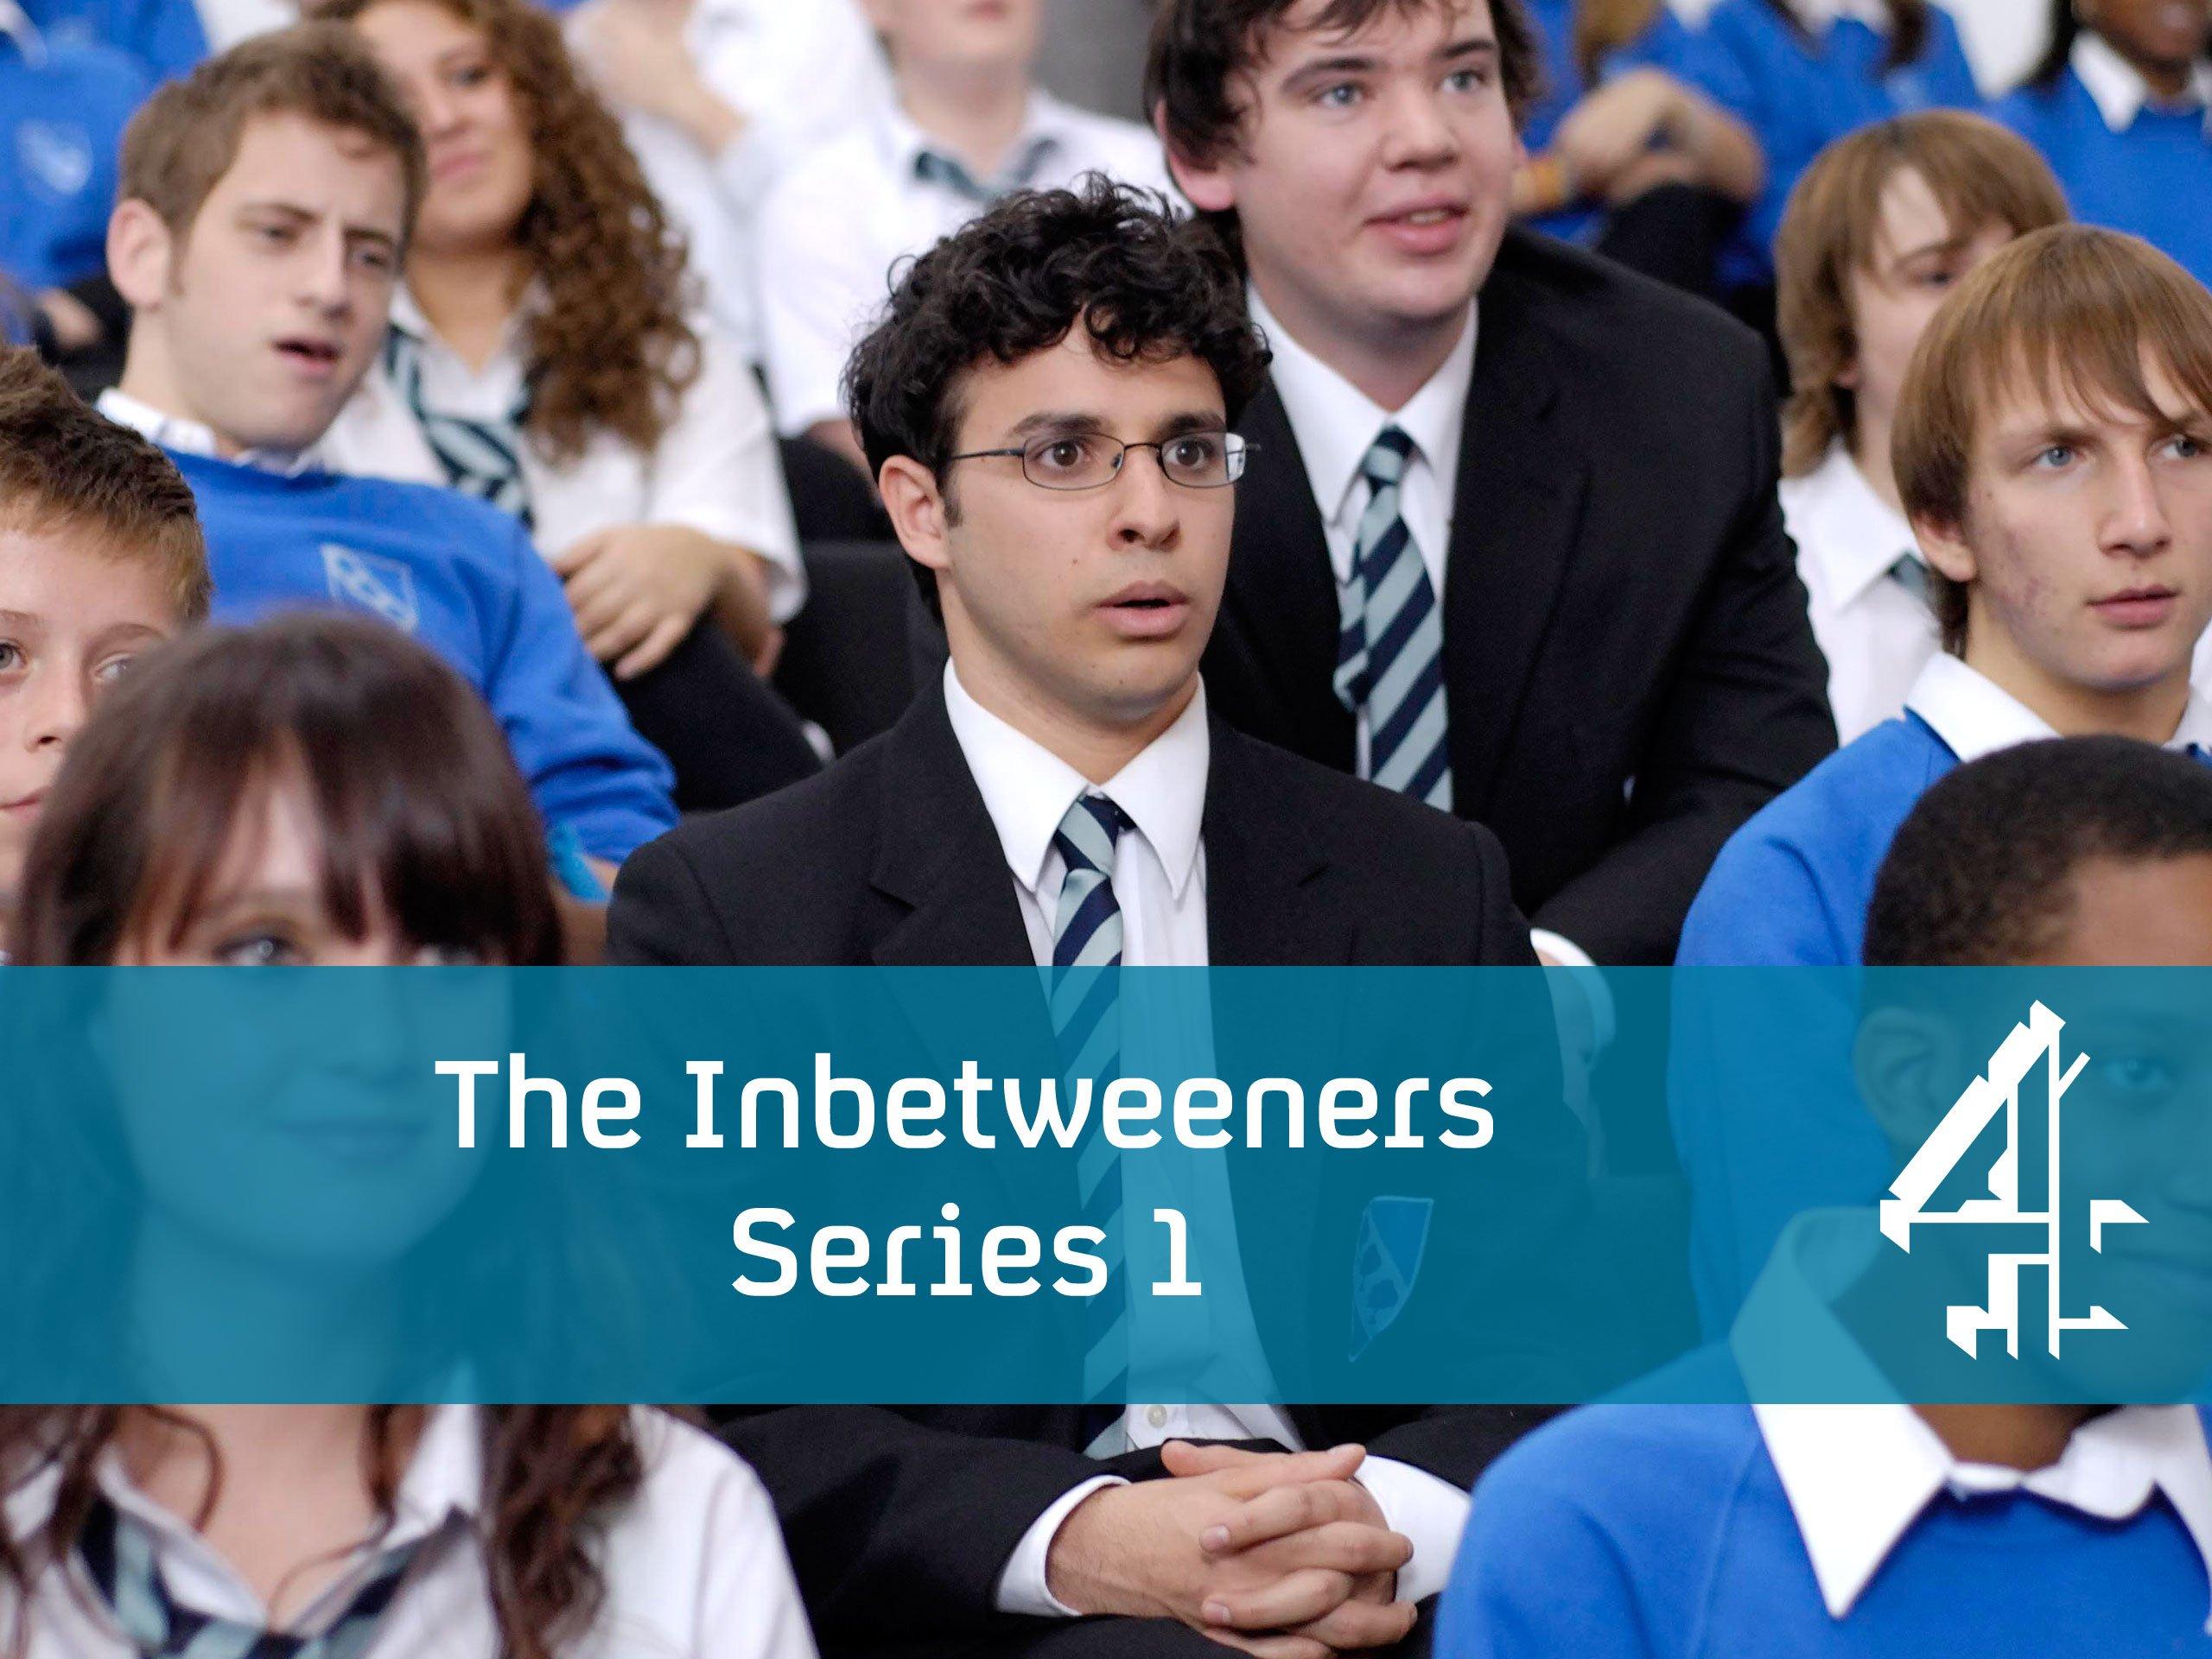 Amazon co uk: Watch The Inbetweeners - Season 1 | Prime Video